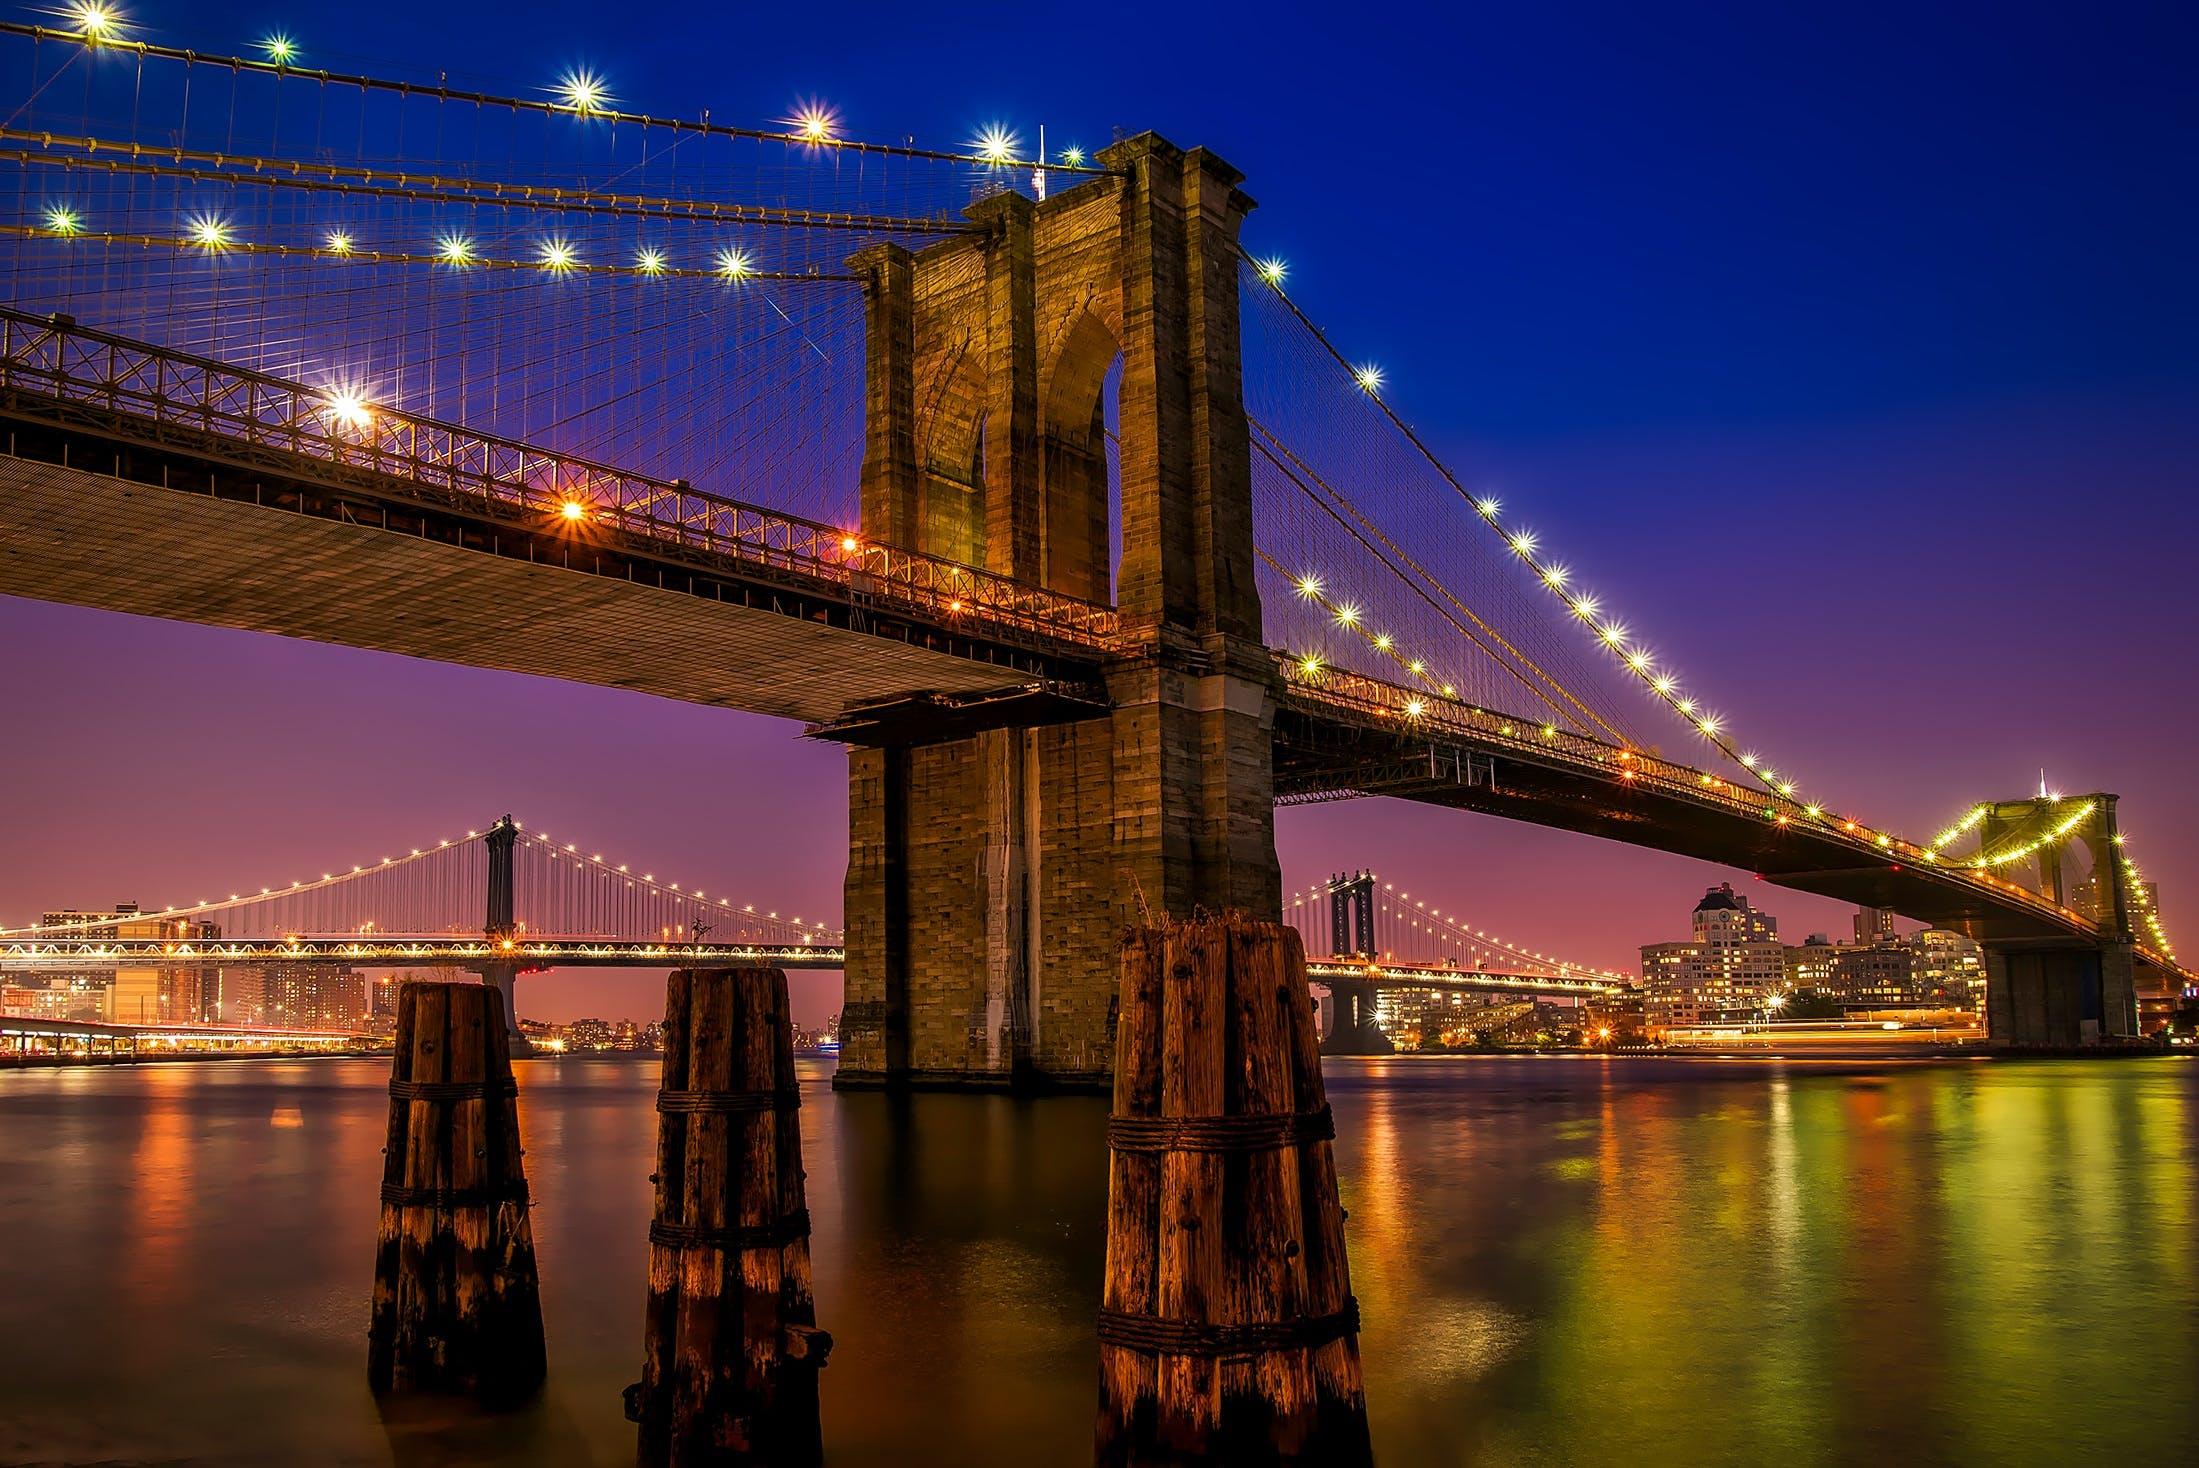 Brooklyn Bridge, New York during Nighttime